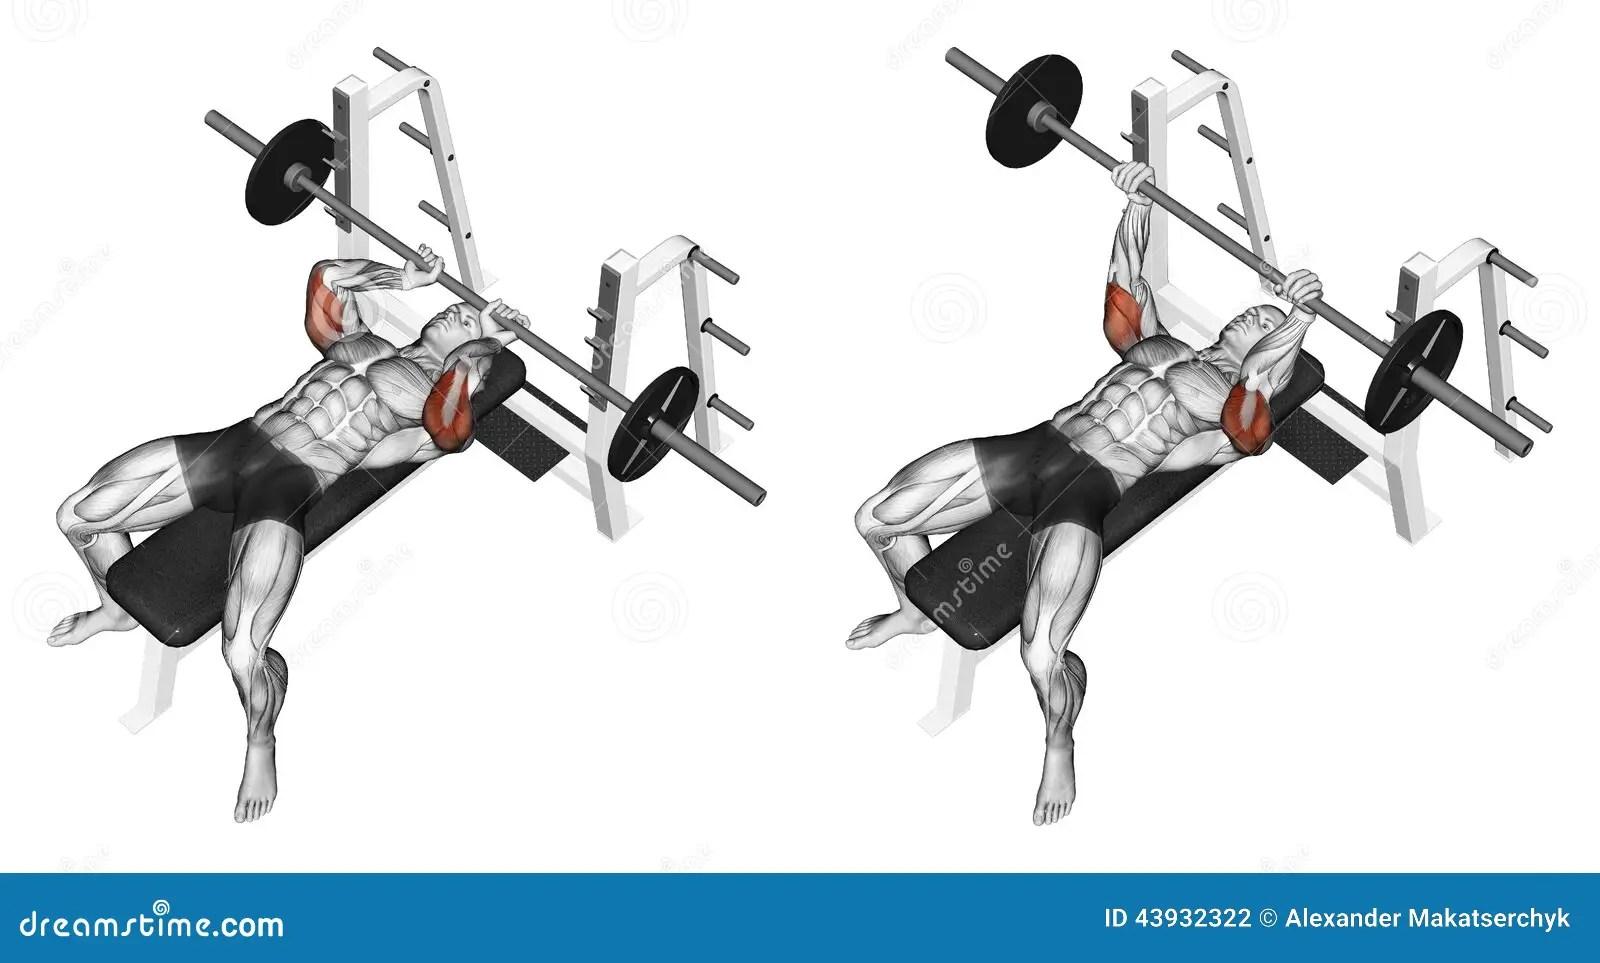 Exercising Extension Barbell Lying Stock Illustration